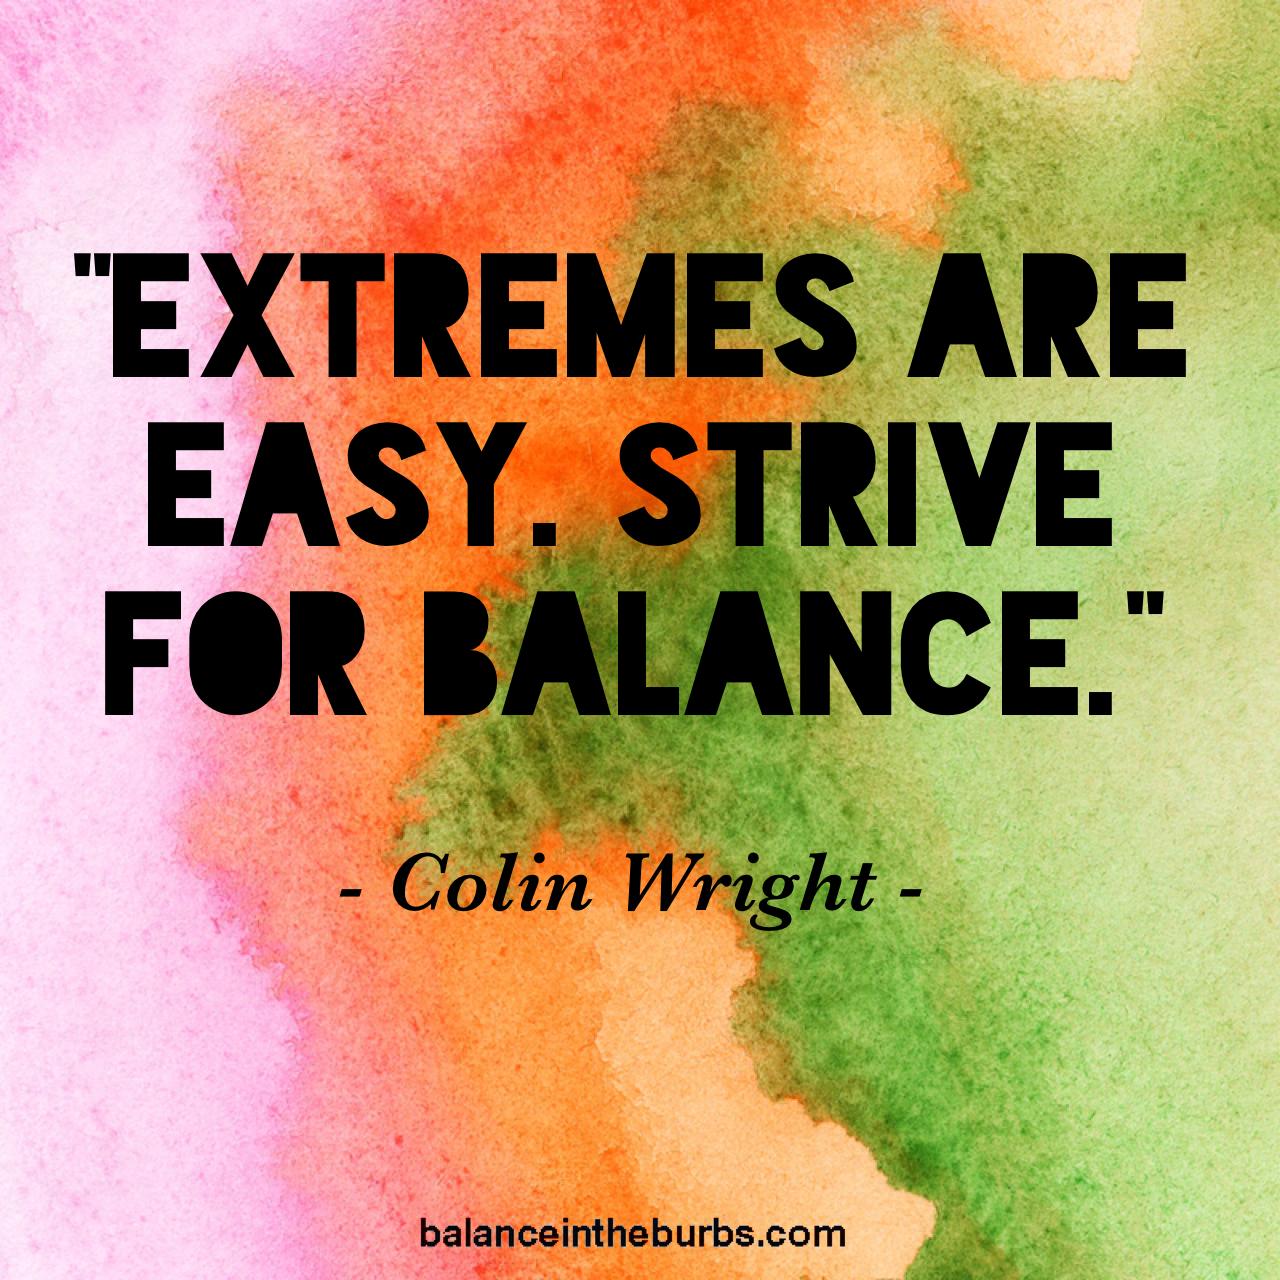 balance-quote.jpg